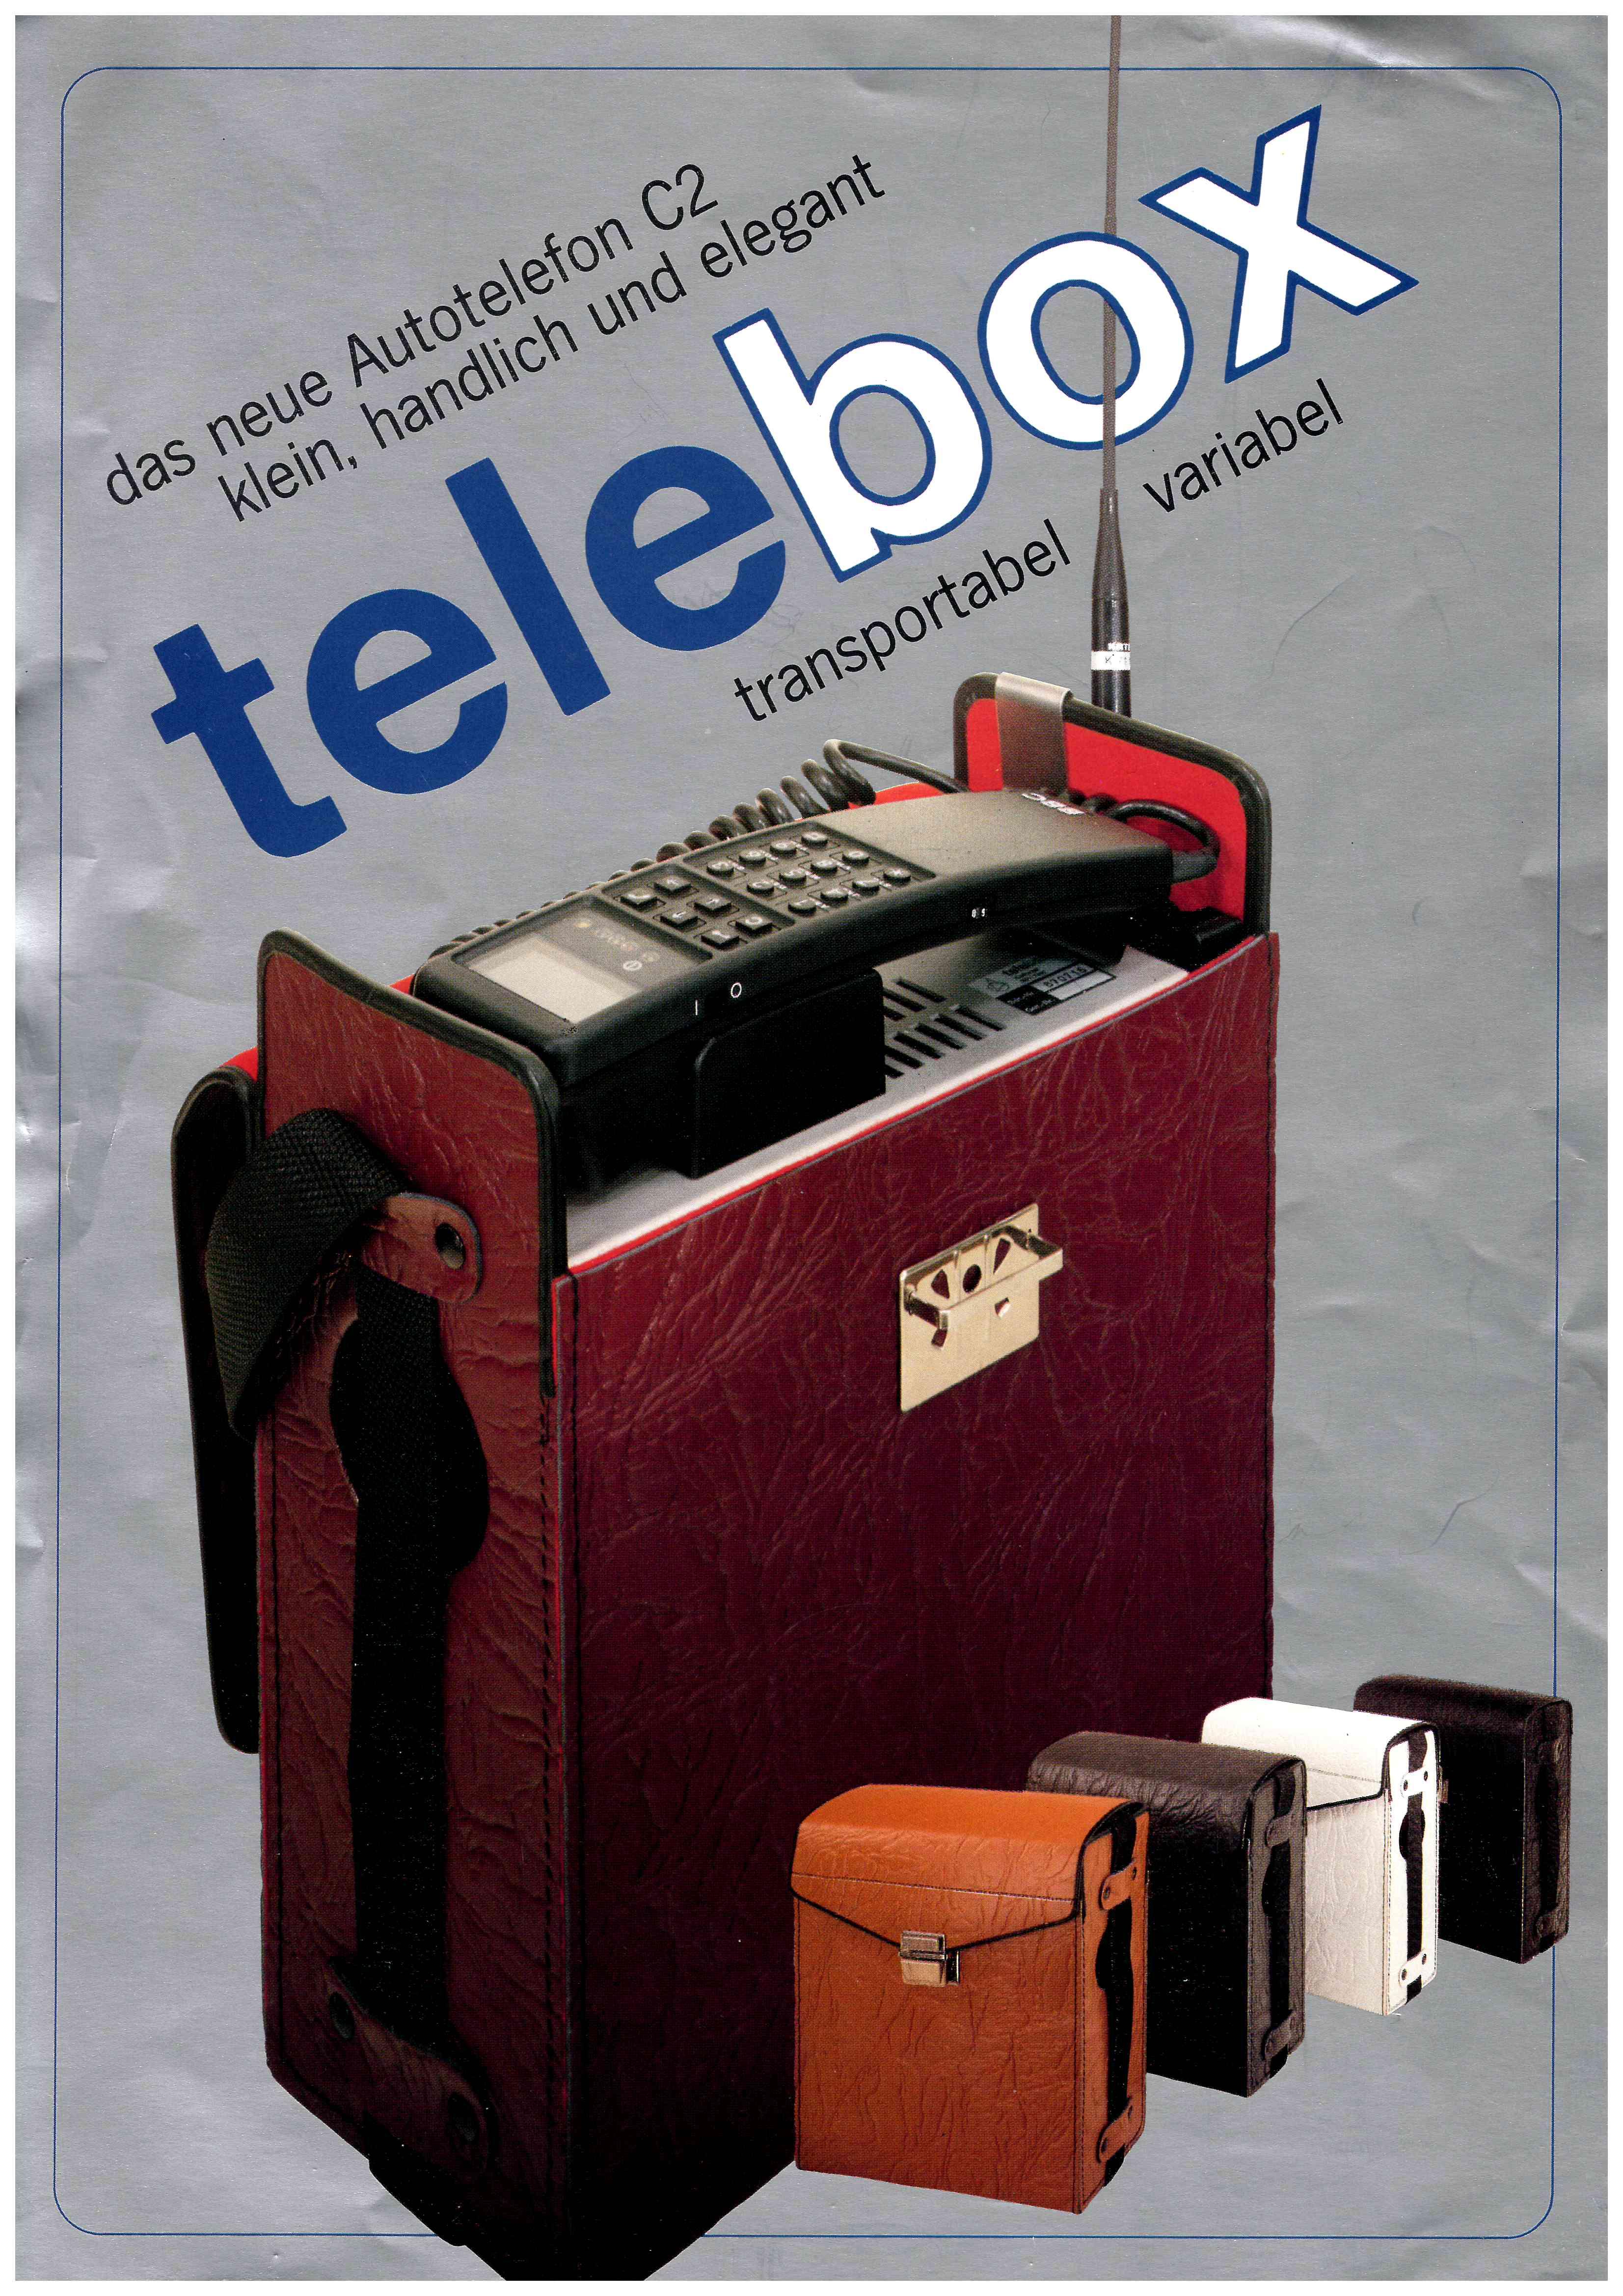 telebox Historie